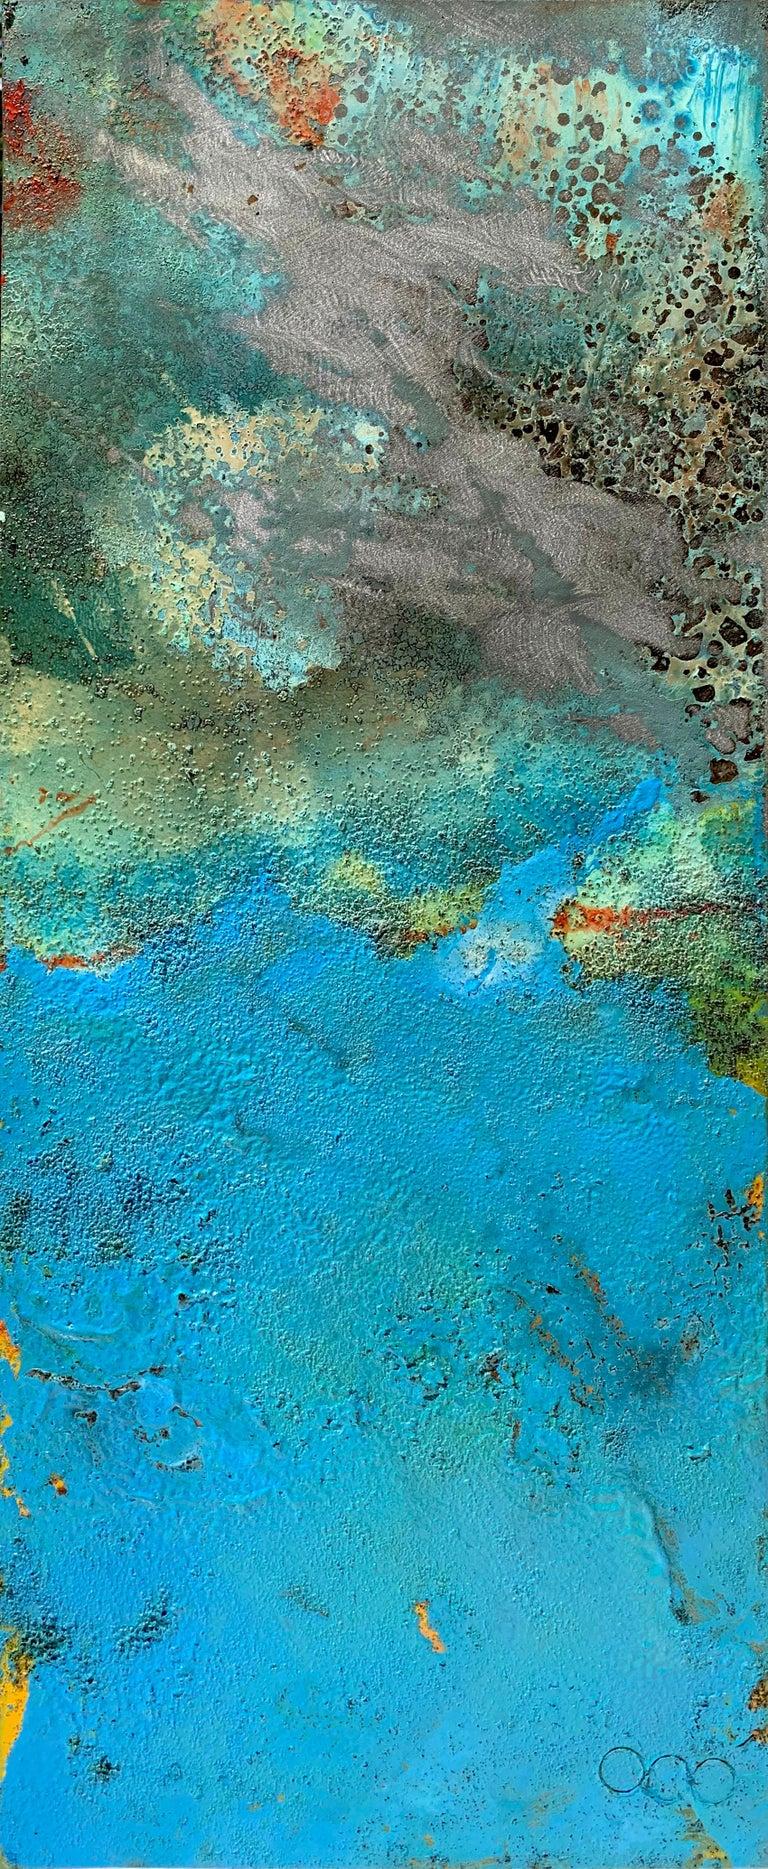 Artist: Sam Peacock  Title: Bury  Materials: Oil, Coffee and Parafin on steel  Medium: Mild steel sheet  Size: 85 x 35 cm  Edition: Original Artwork  Year: 2018  _________________________________________________________________________  Sam